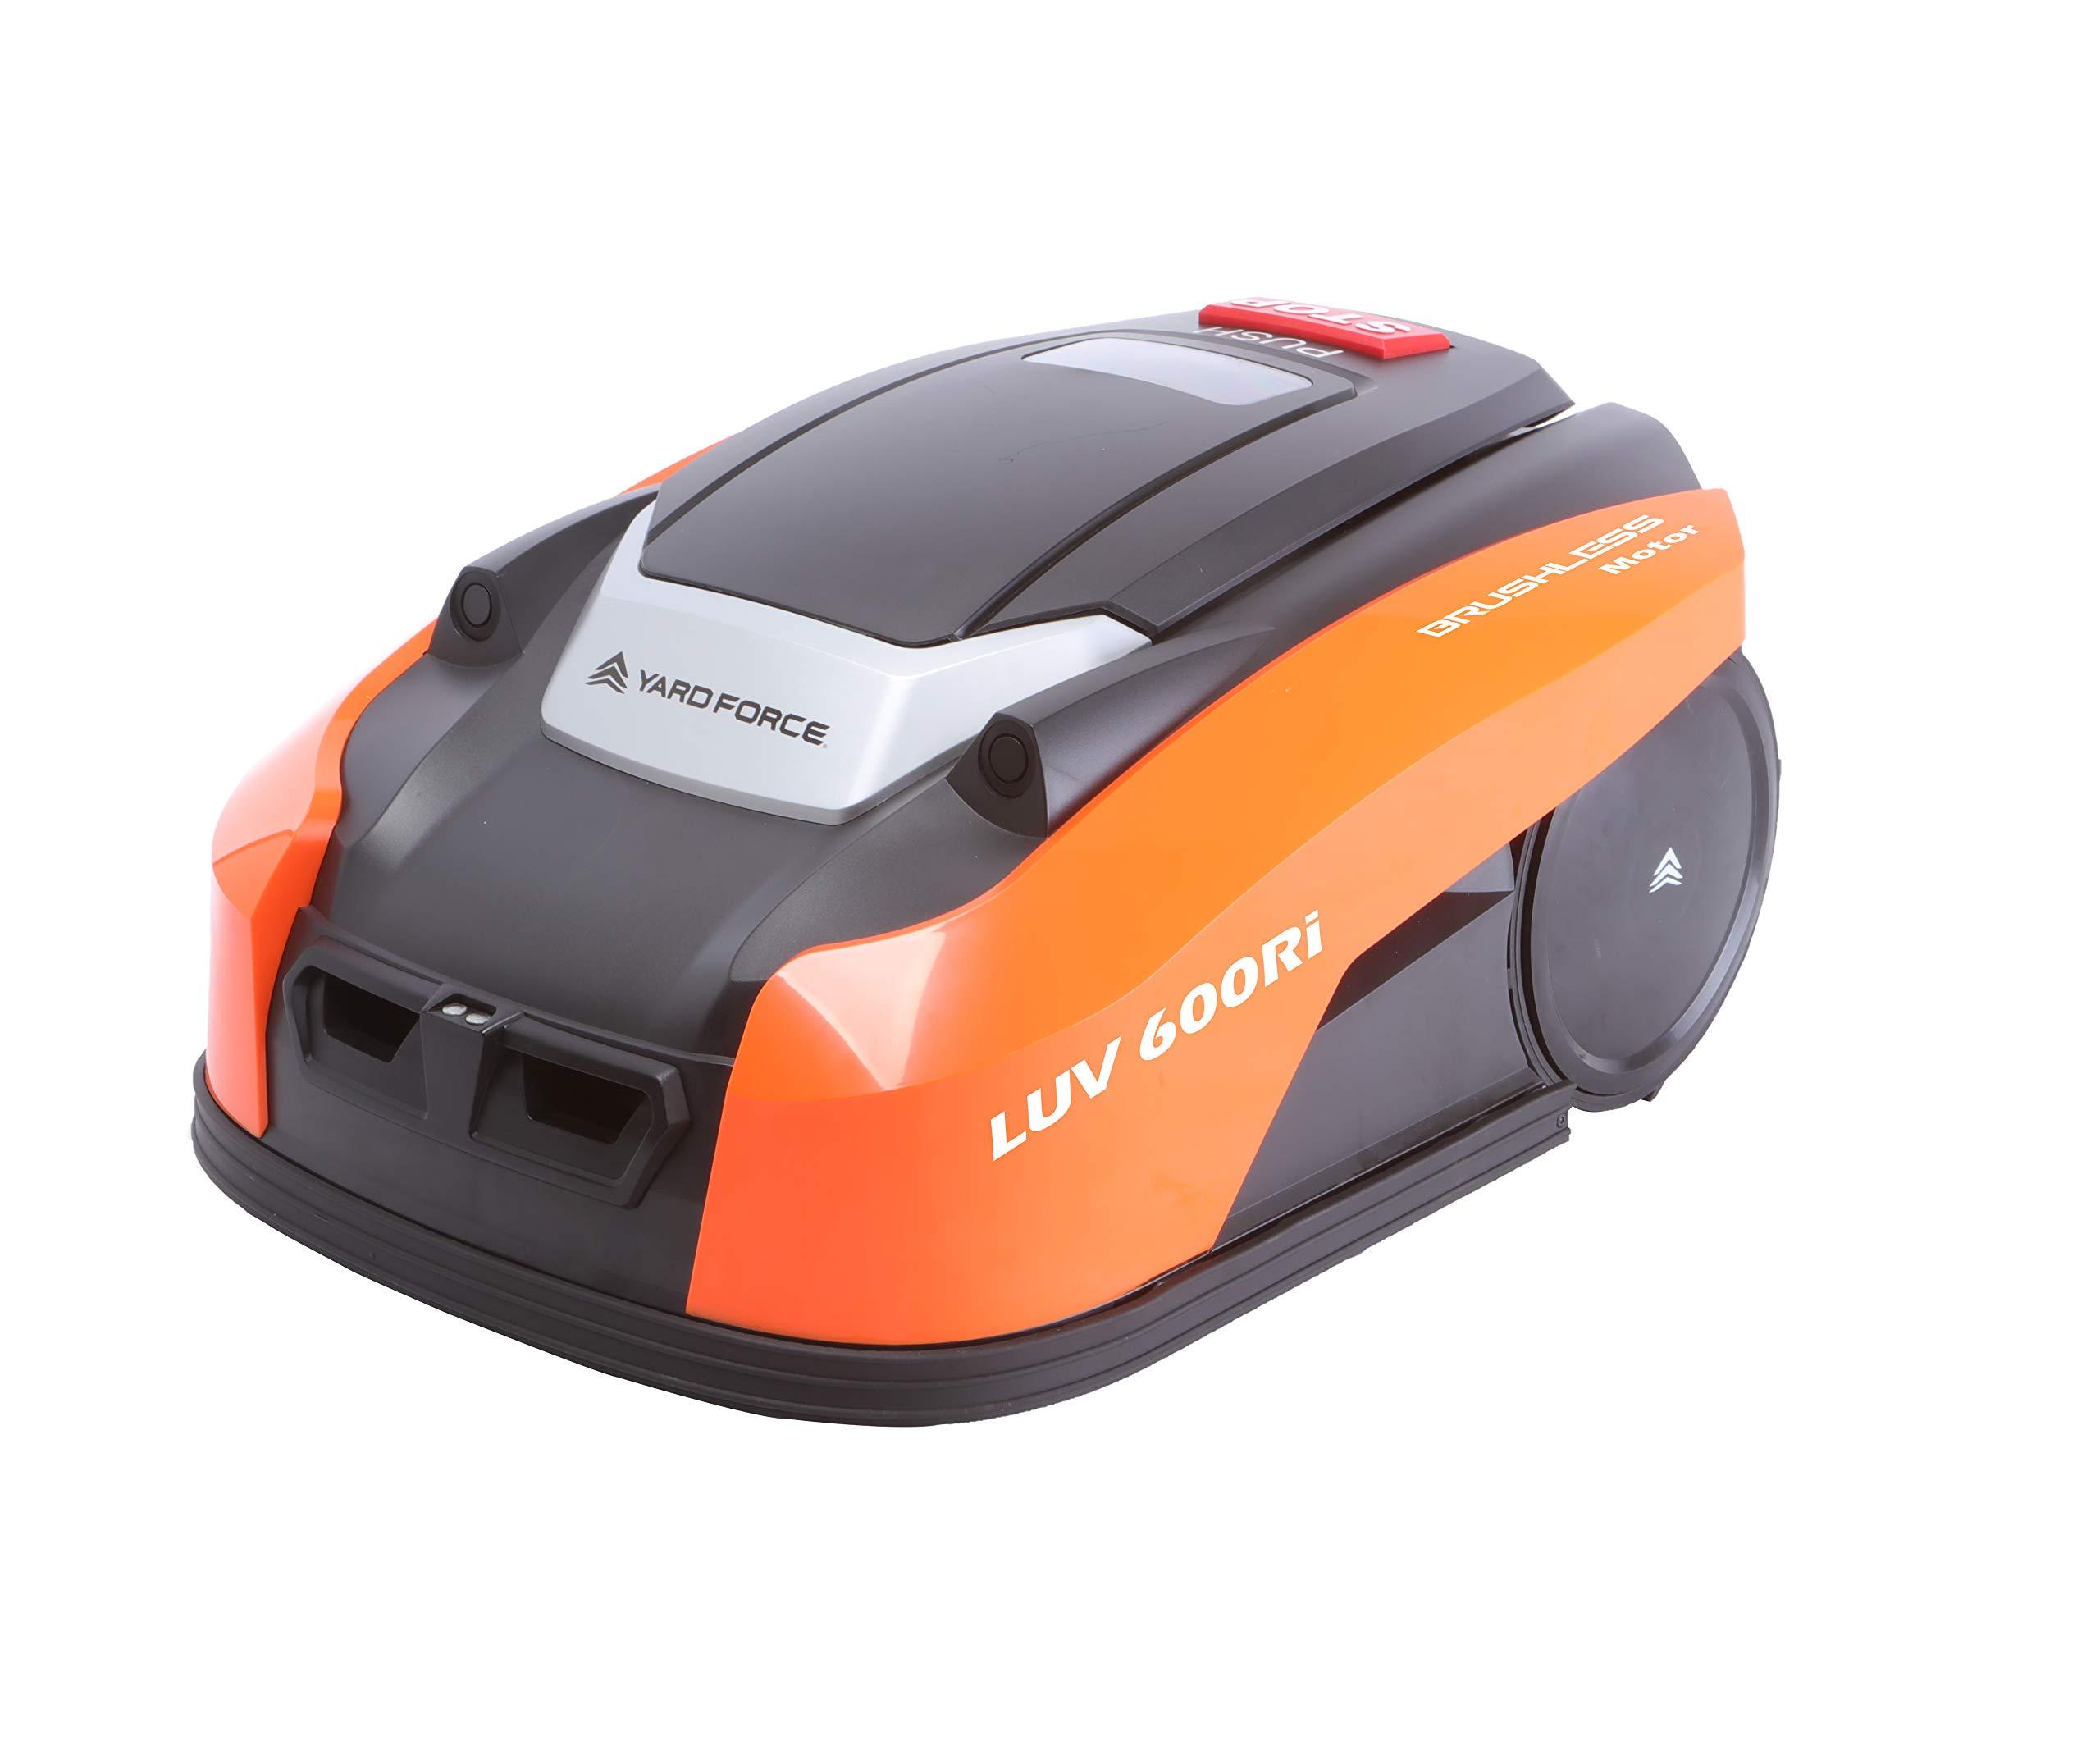 YARD-FORCE-Mhroboter-LUV-600Ri-bis-zu-600-qm-Selbstfahrender-Rasenmher-Roboter-mit-WLAN-Verbindung-App-Steuerung-iRadar-Ultraschallsensor-Kantenschneide-Funktion-und-brstenloser-Motor